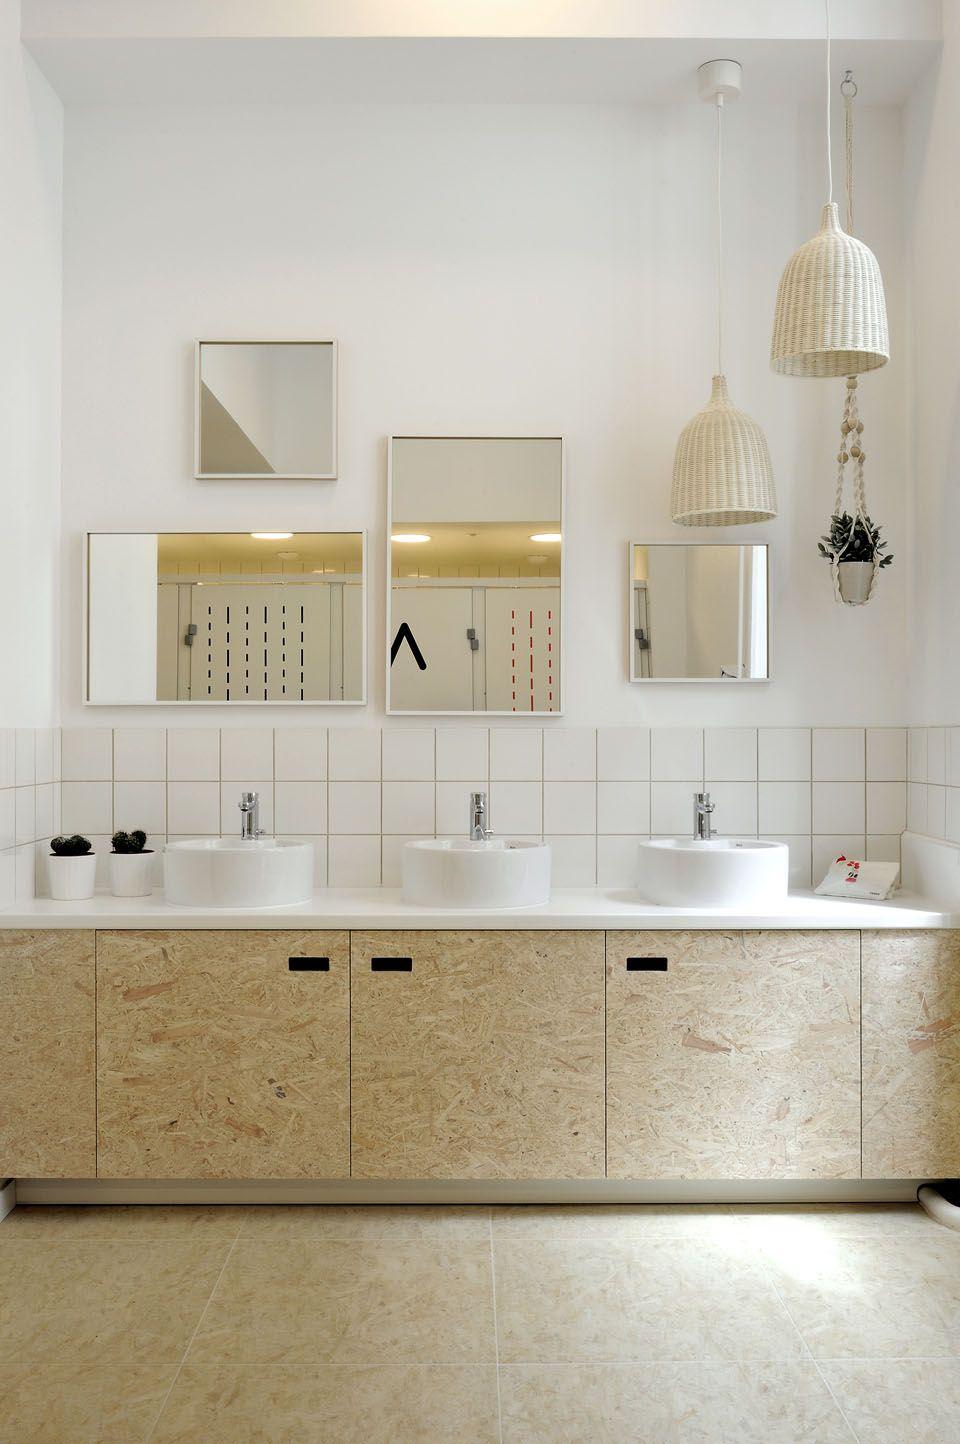 Osb Dans Salle De Bain hot spot lyonnais | deco salle de bain, idée salle de bain